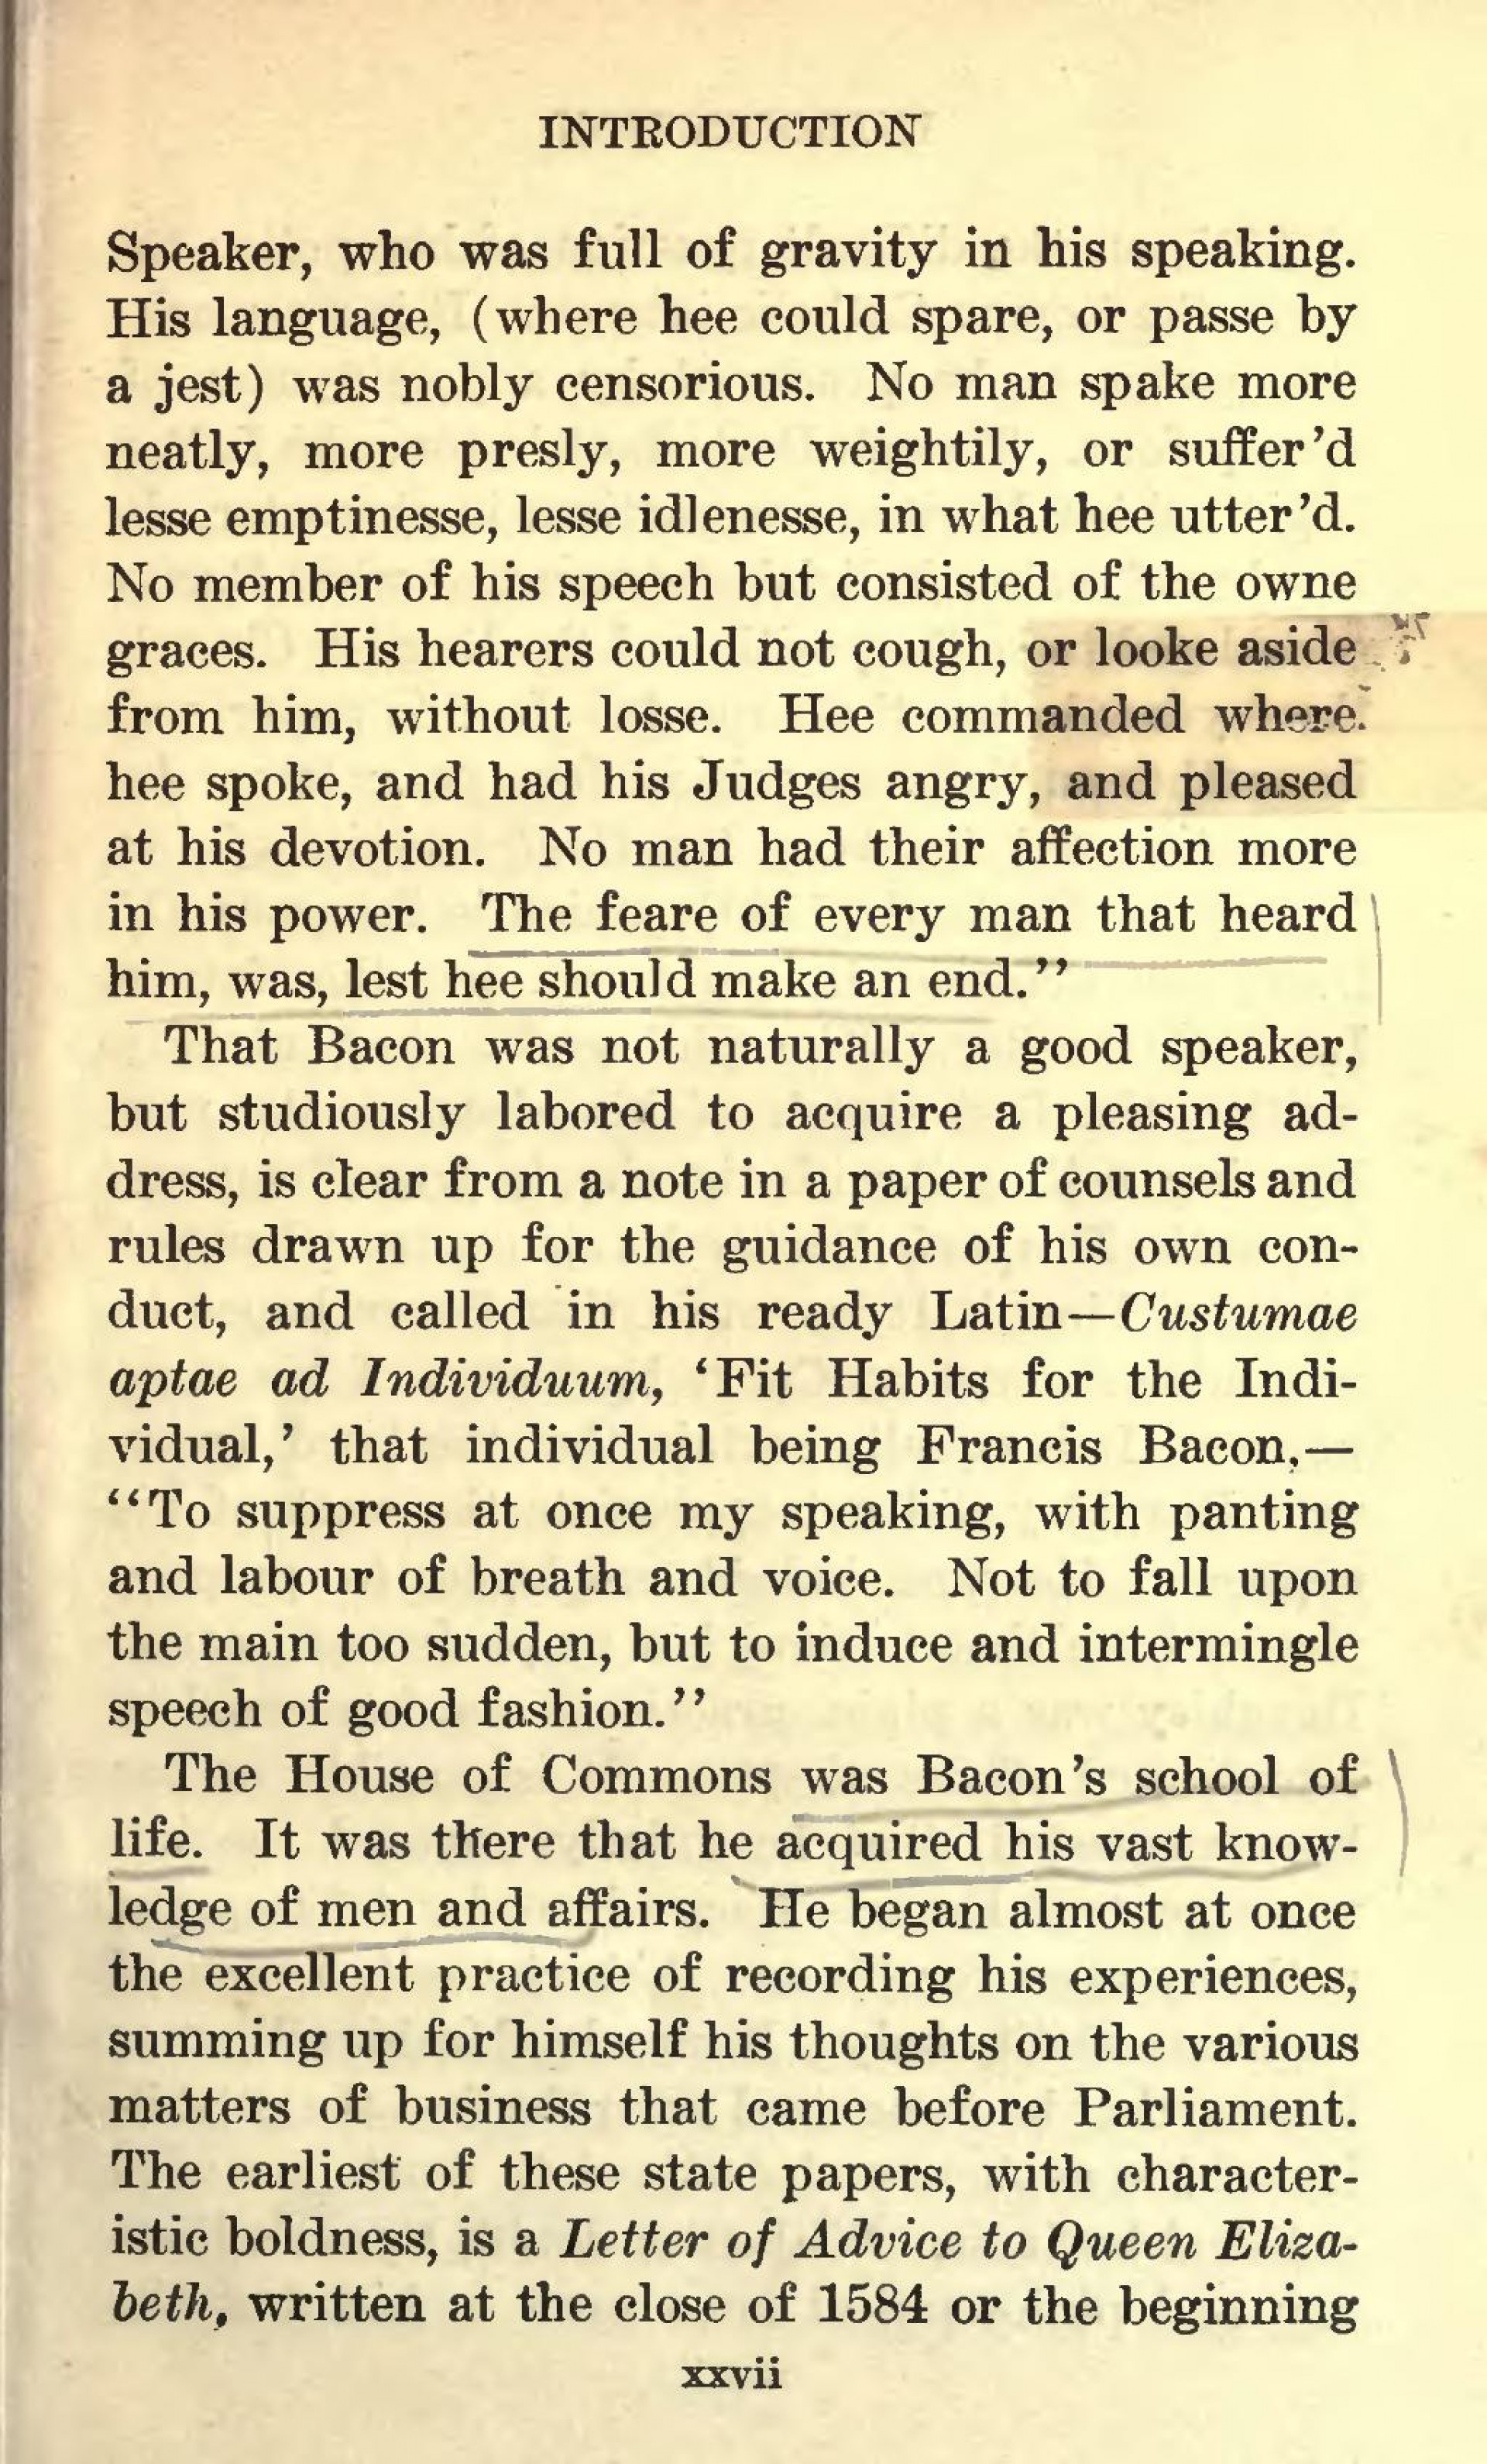 004 Essay Example Bacons Essays Page35 1024px Of Francis Bacon 1908 Scott Amazing Google Books Truth Quiz Bacon's Summary 1920